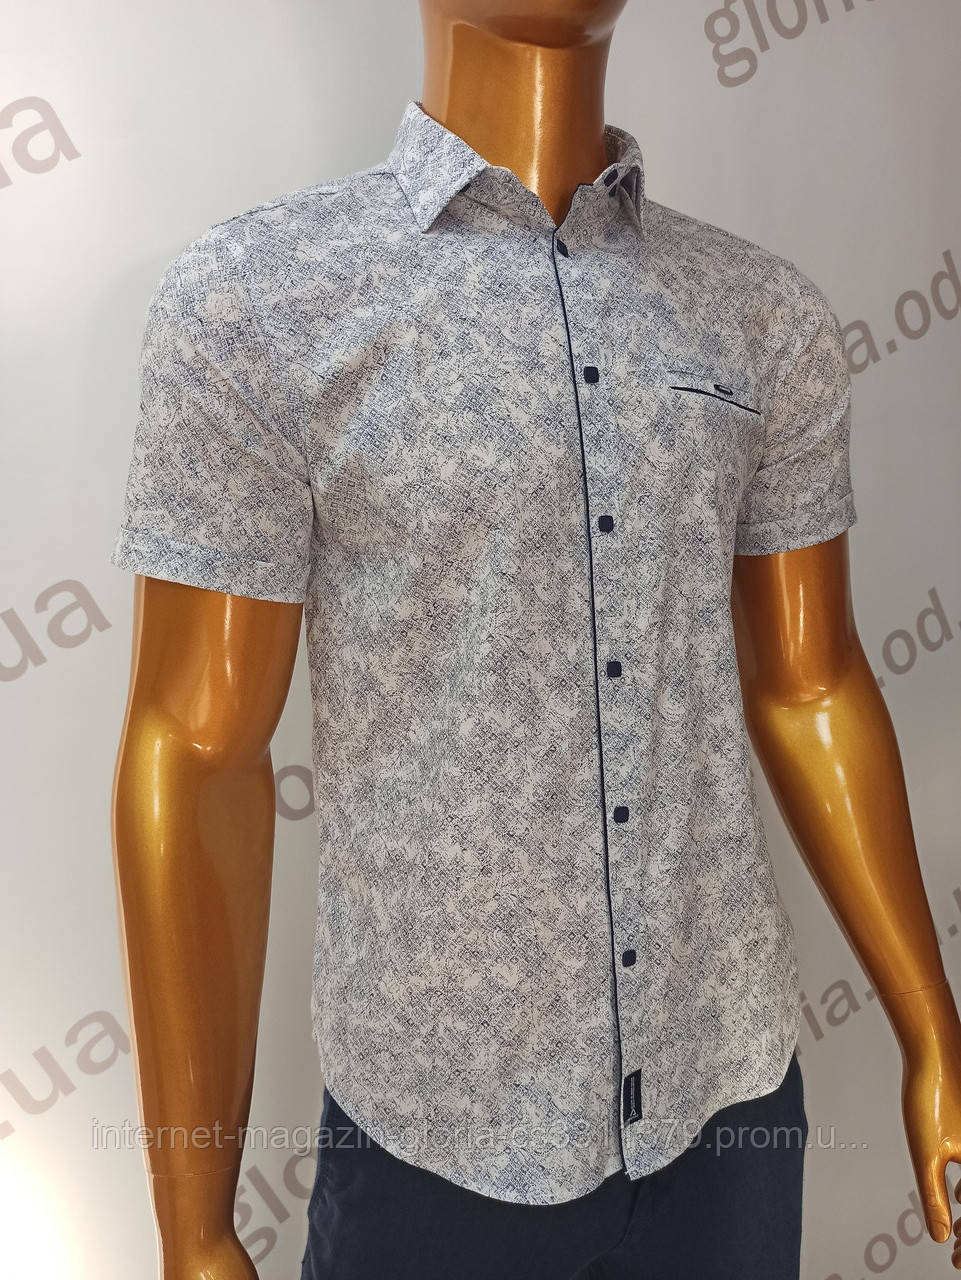 Мужская рубашка Amato. AG.19839(b). Размеры:M,L,XL, XXL.